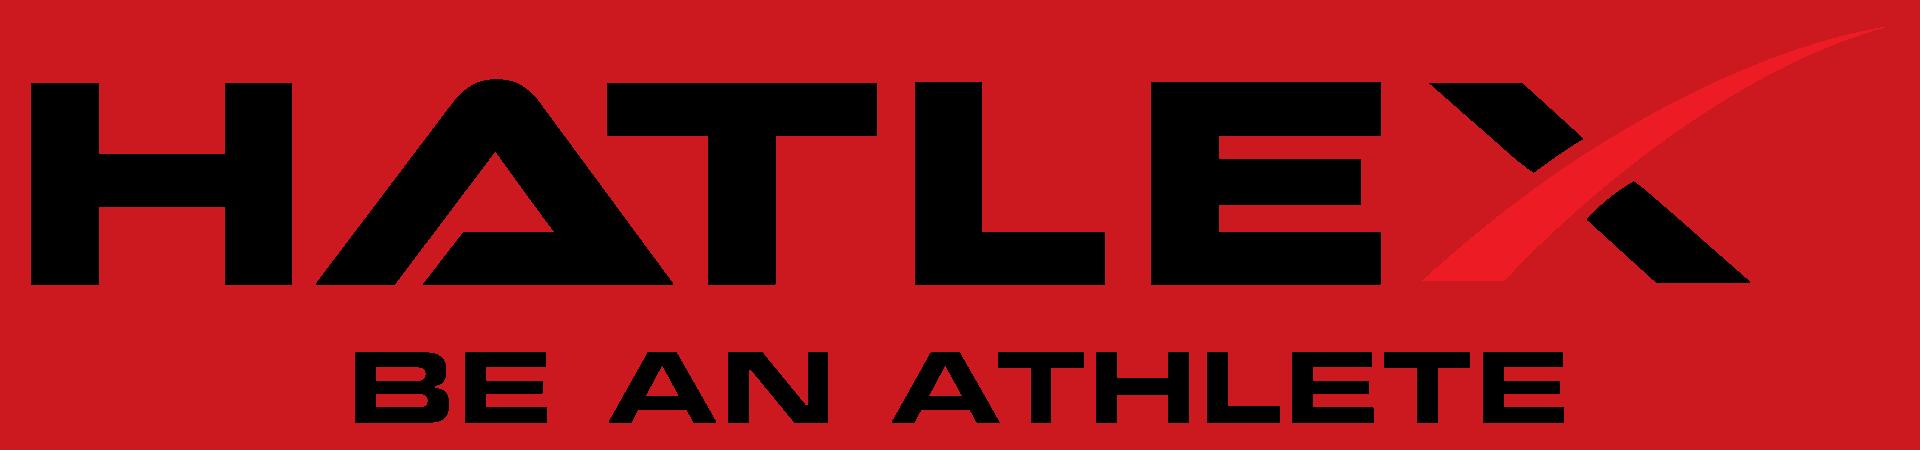 hatlex-2